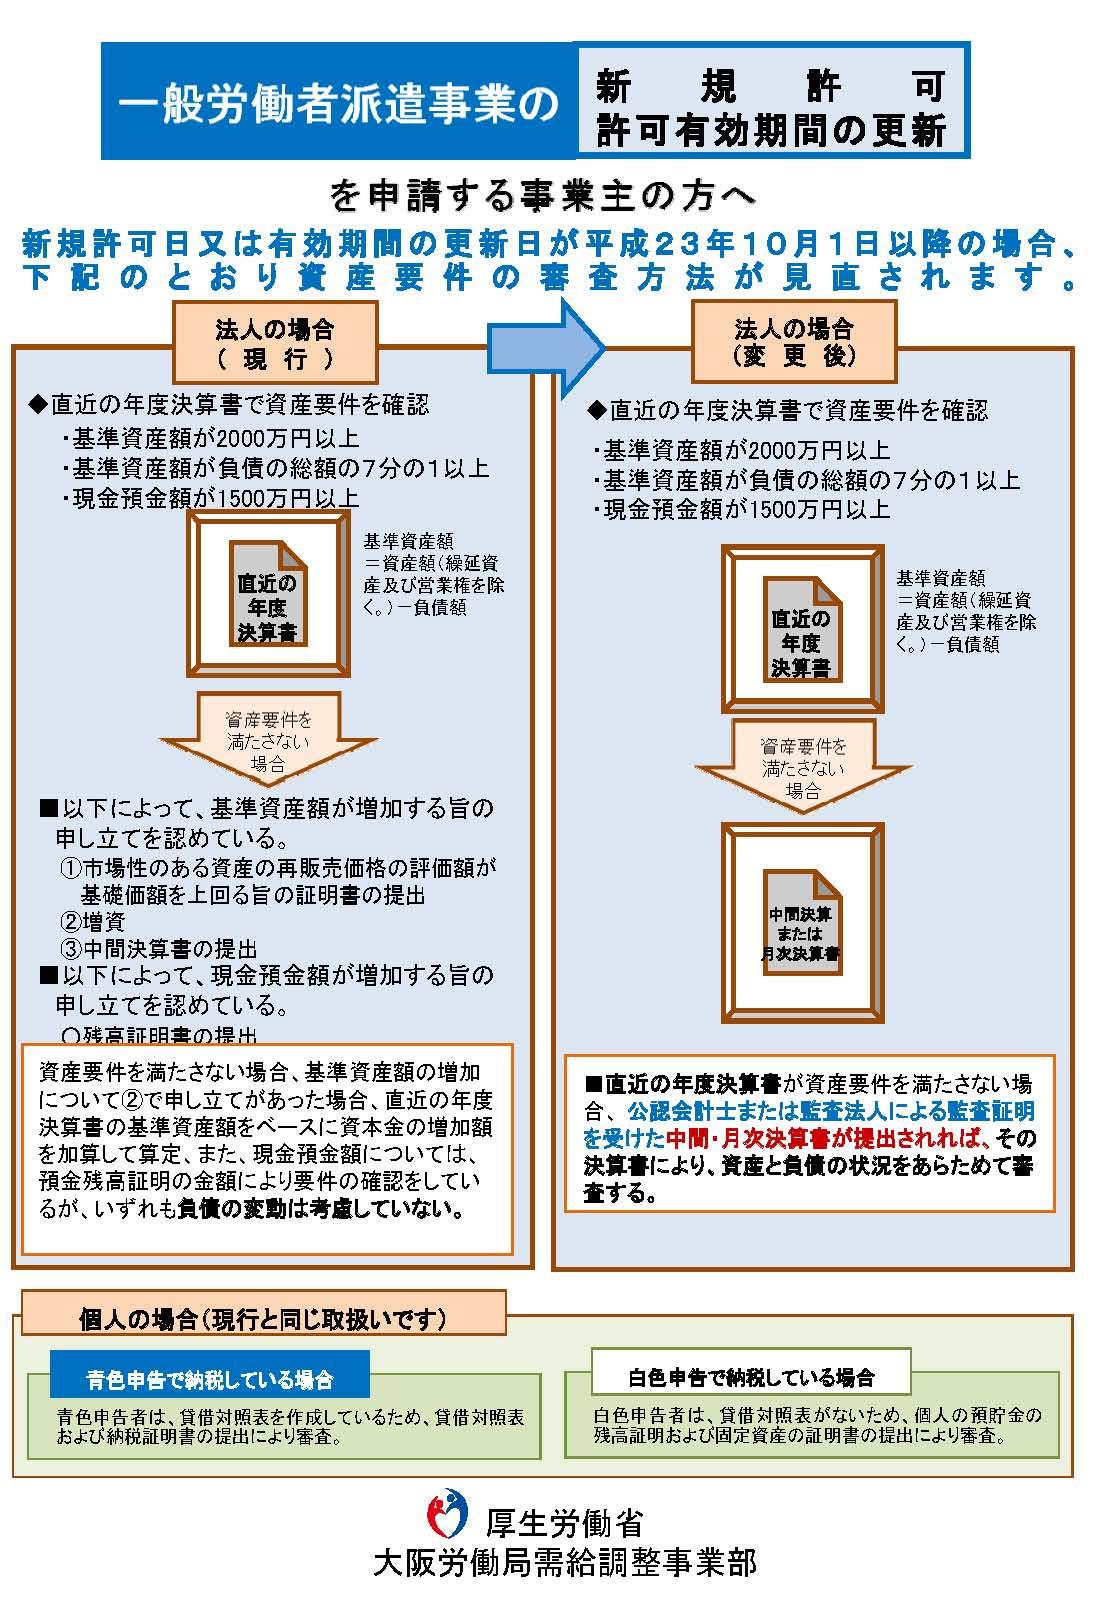 一般労働者派遣事業の新規許可、許可有効期間の更新